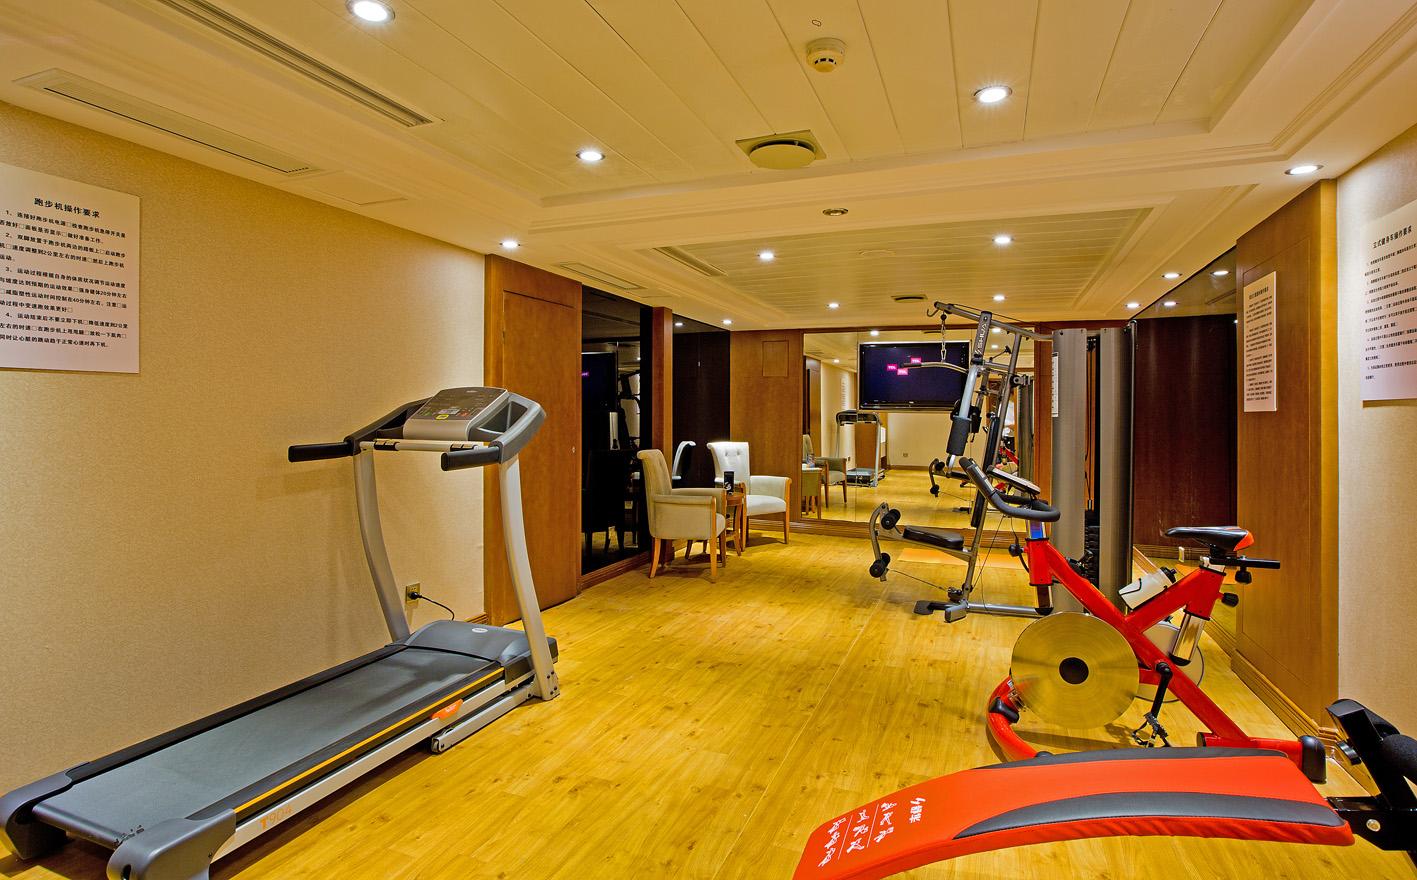 President Cruises President No. 8 Gym.jpg